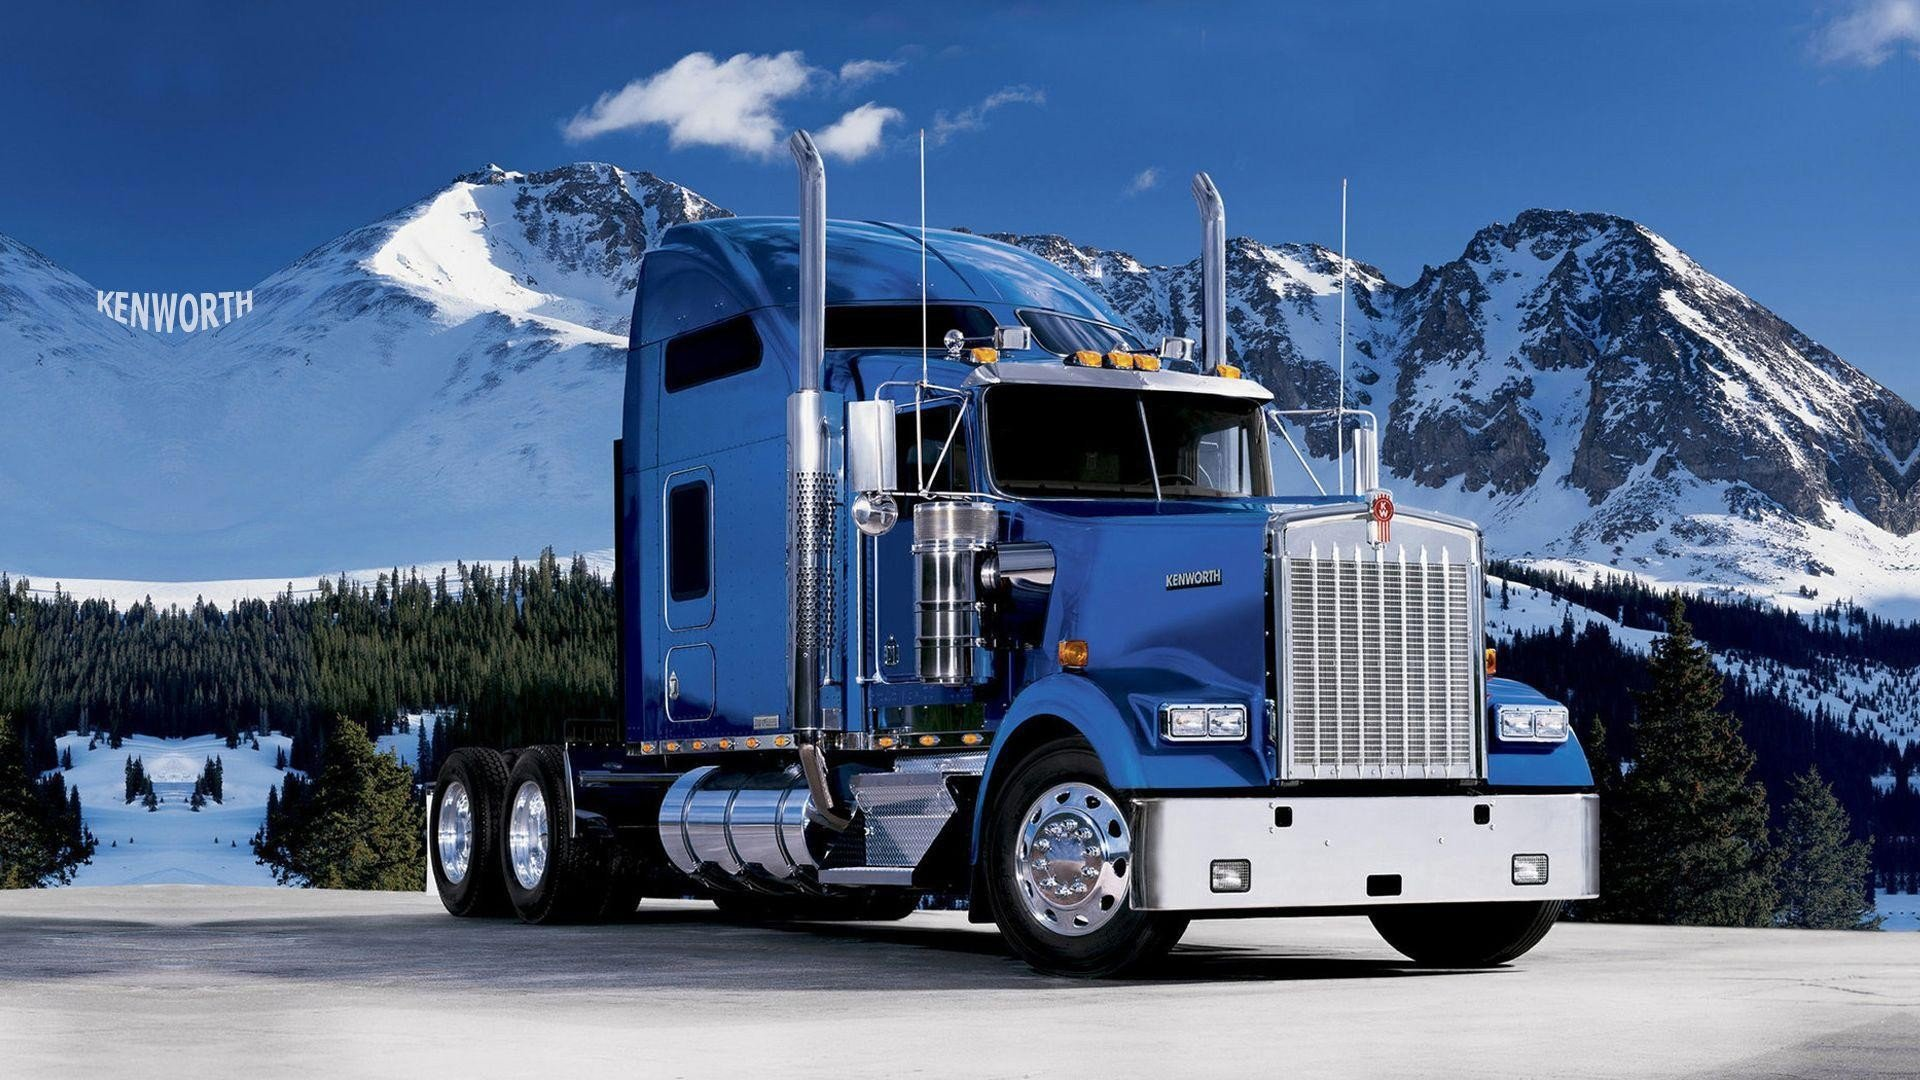 Trucks kenworth Peterbilt wallpaper 1920x1080 292206 WallpaperUP 1920x1080